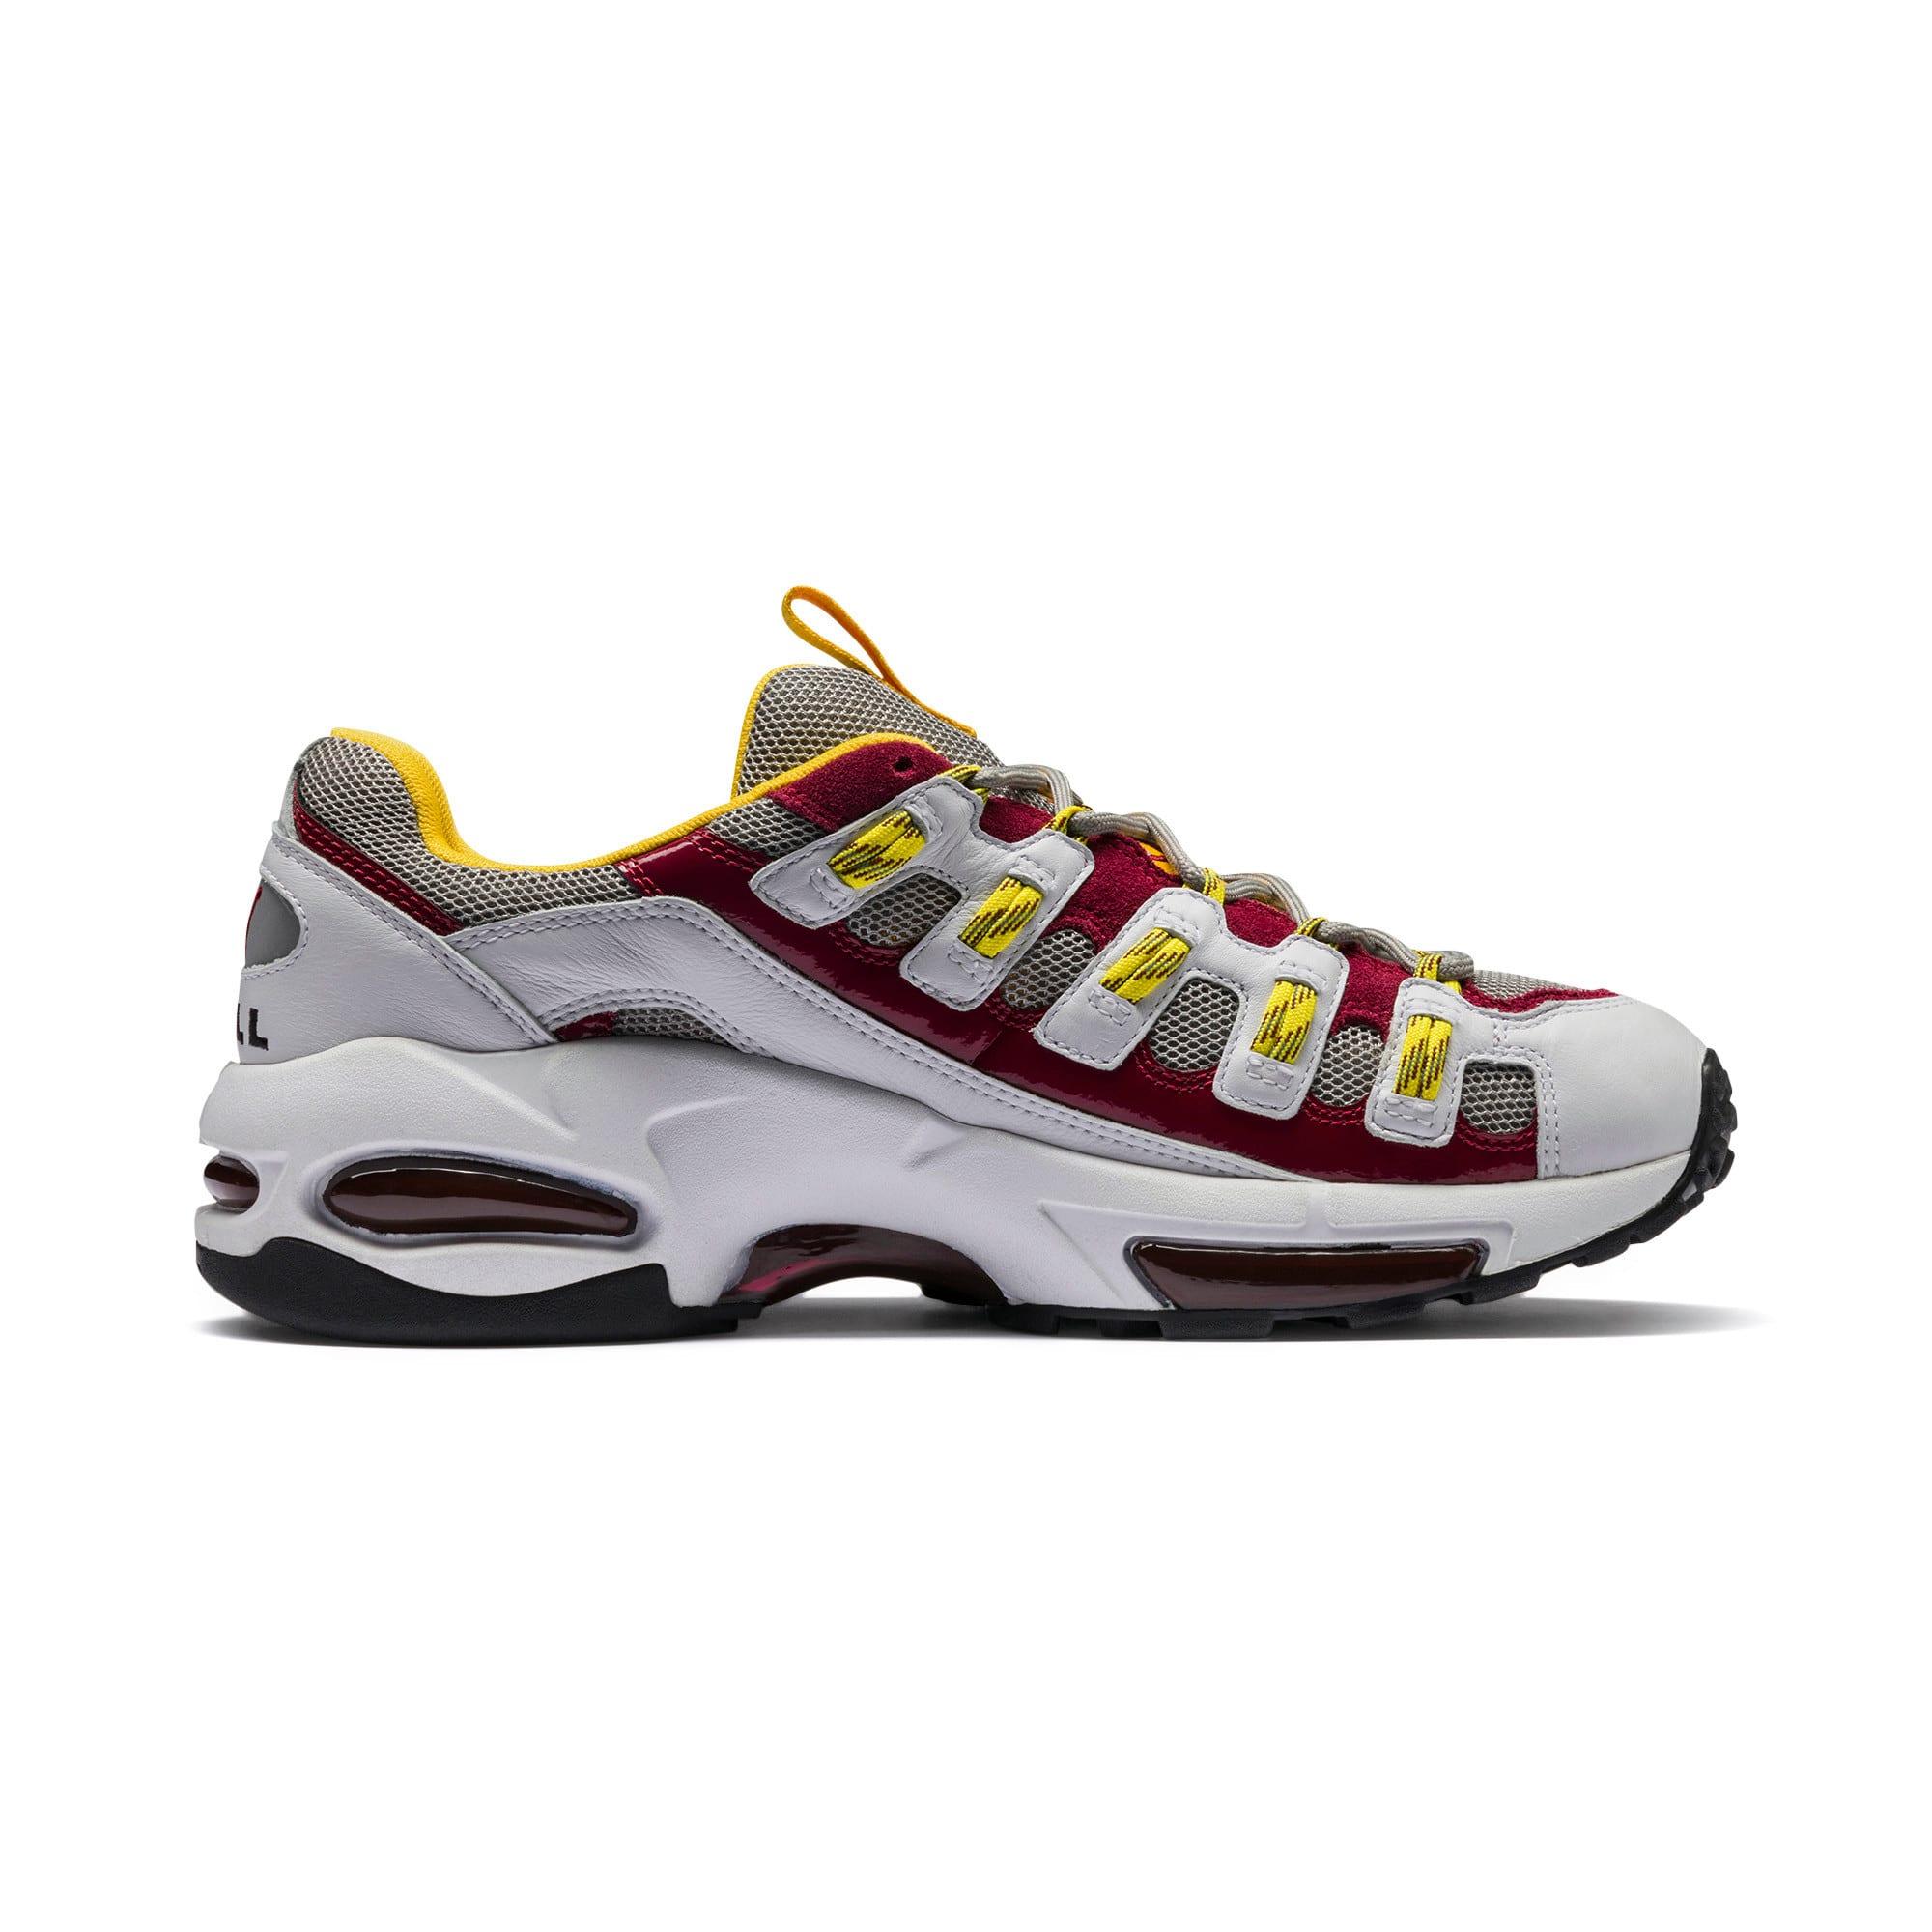 Thumbnail 6 of CELL Endura Patent 98 Men's Sneakers, Limestone-Cordovan, medium